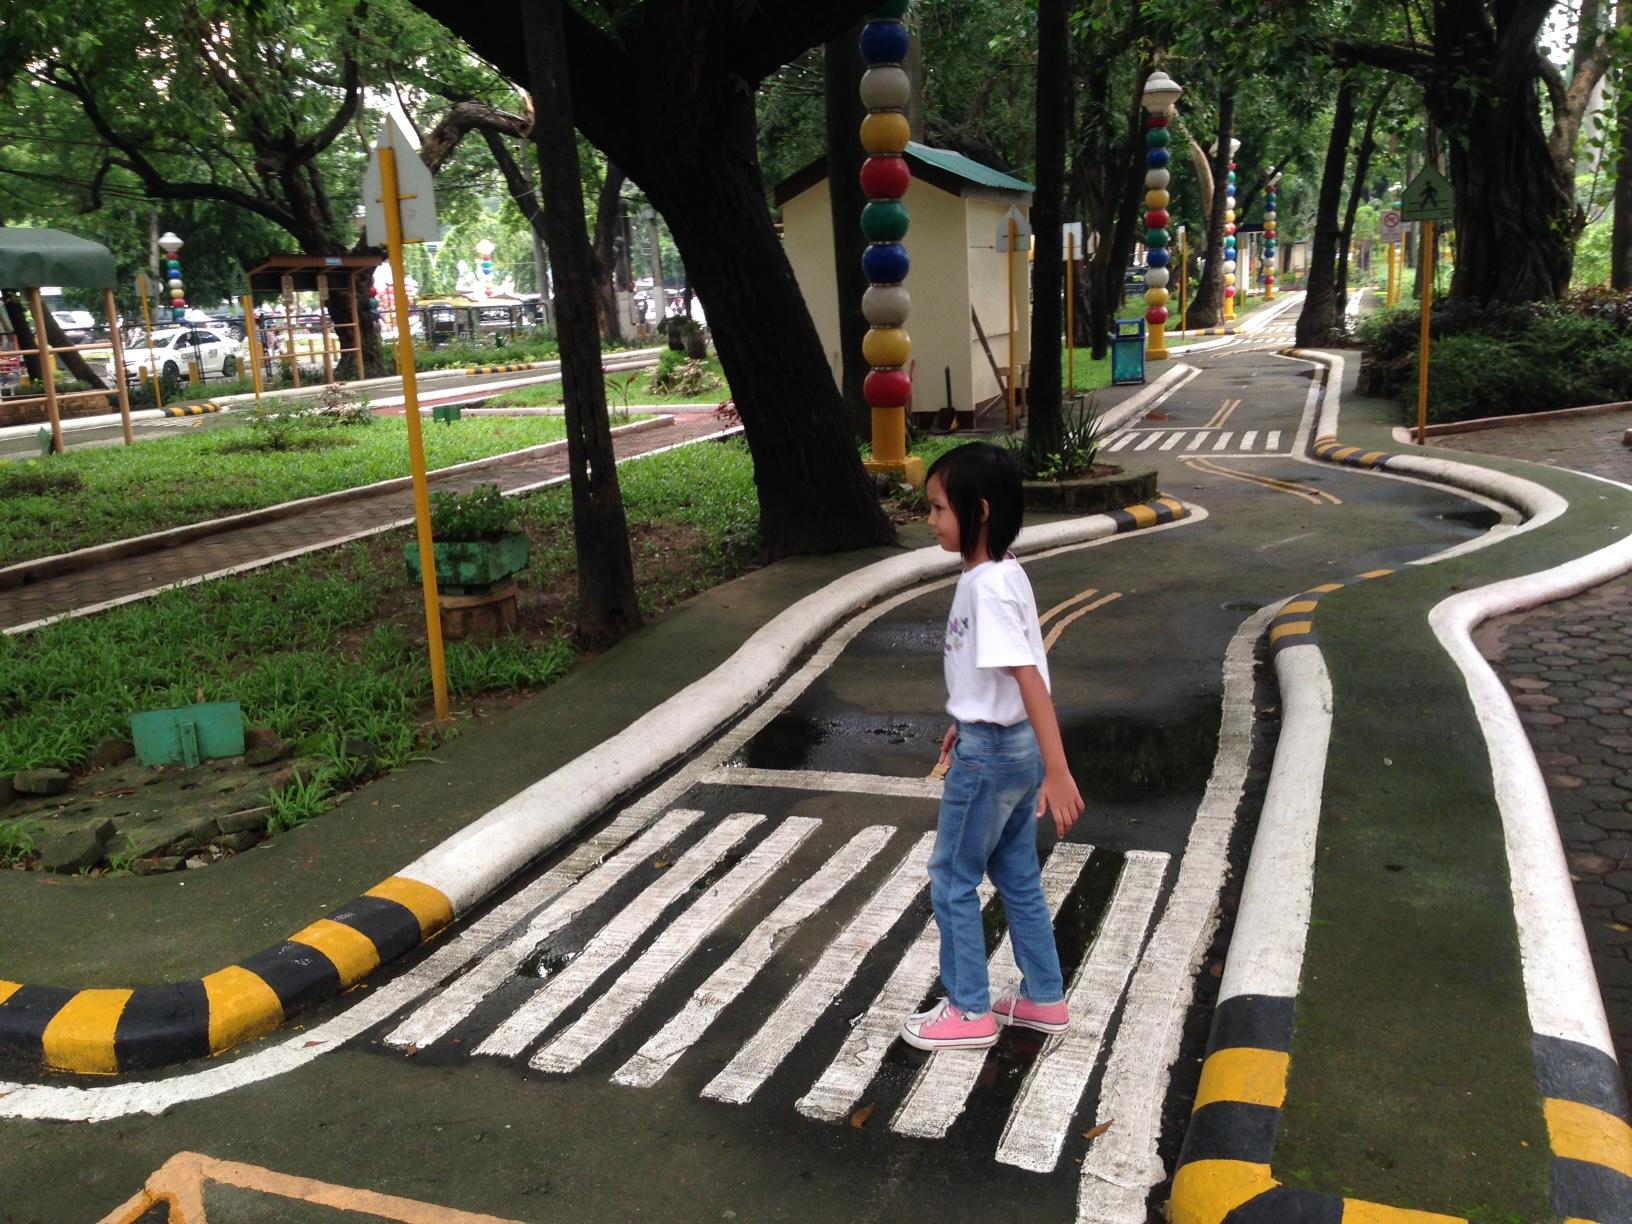 MMDA Children's Road Safety Park pedestrian crossing